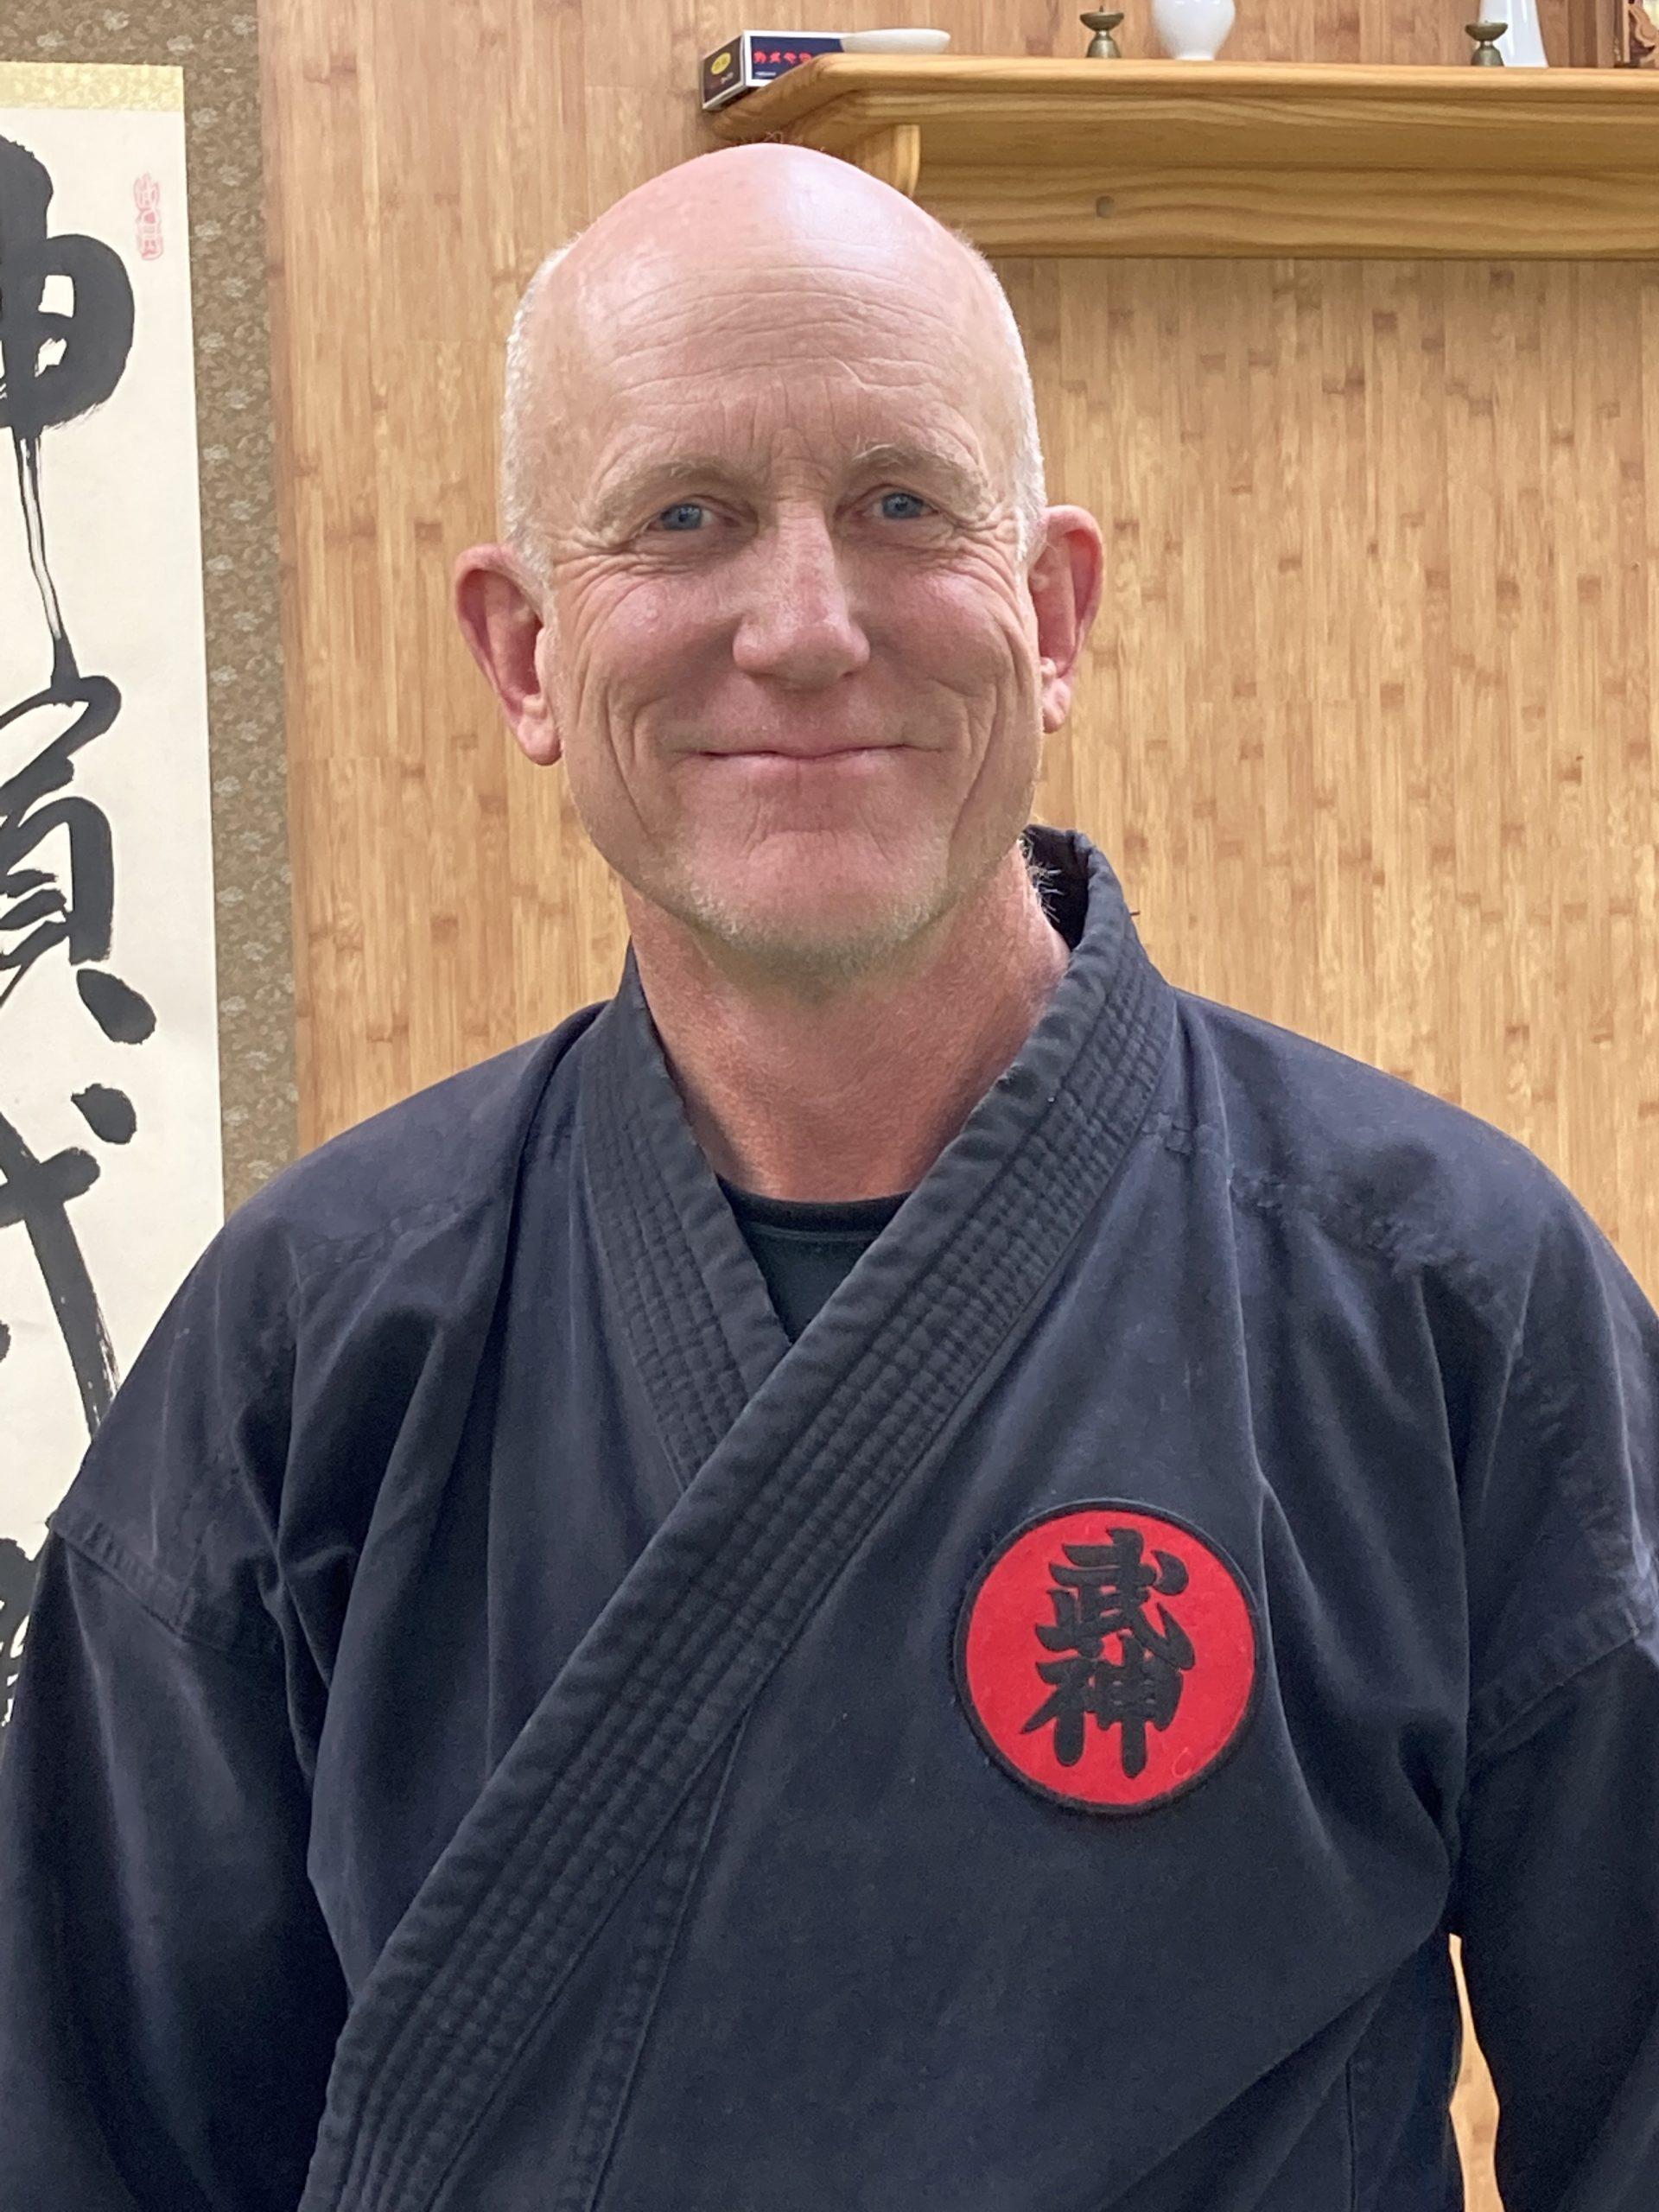 Instructor Philip Keuper